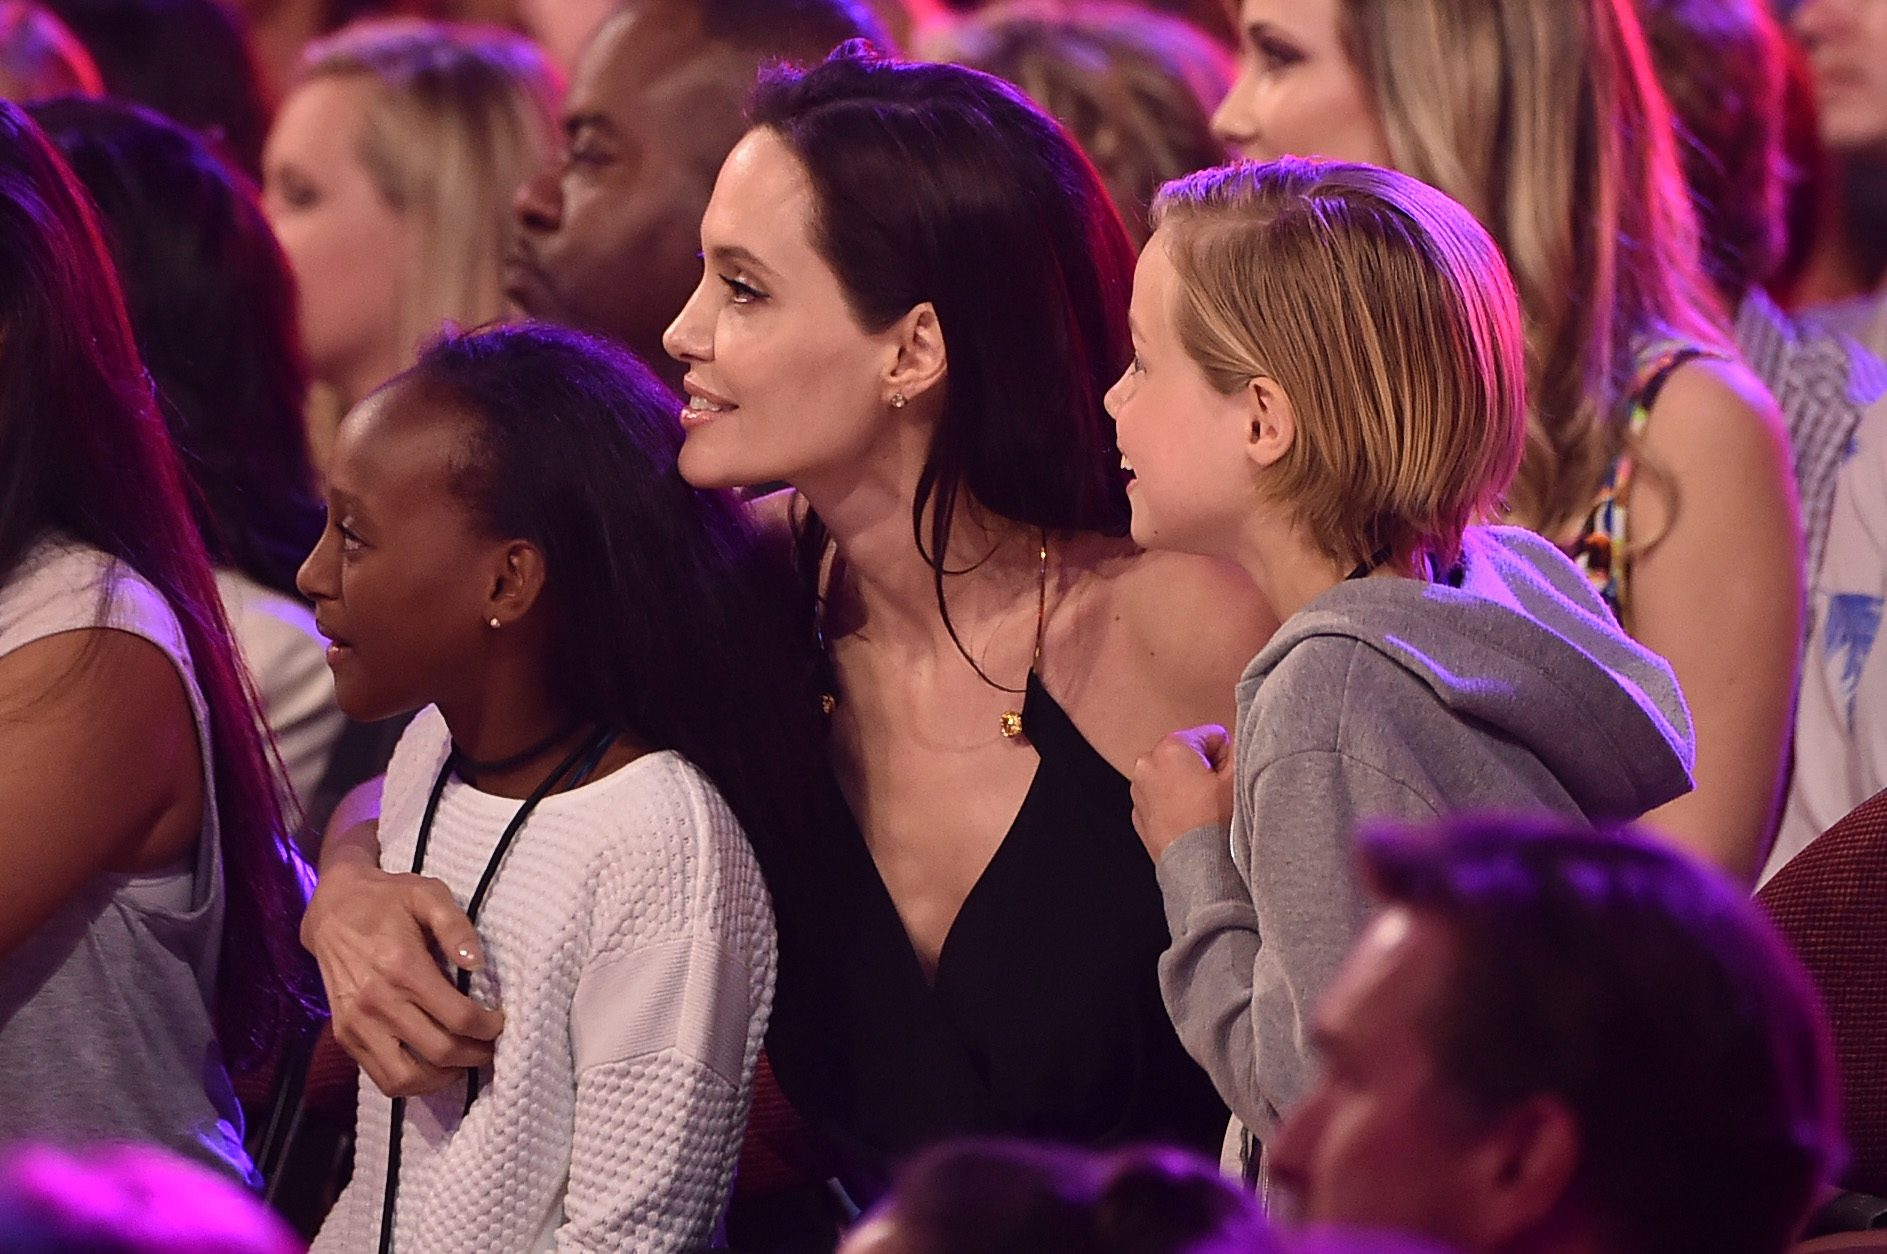 actress Angelina Jolie hugs Zahara Marley Jolie-Pitt and Shiloh Nouvel Jolie-Pitt